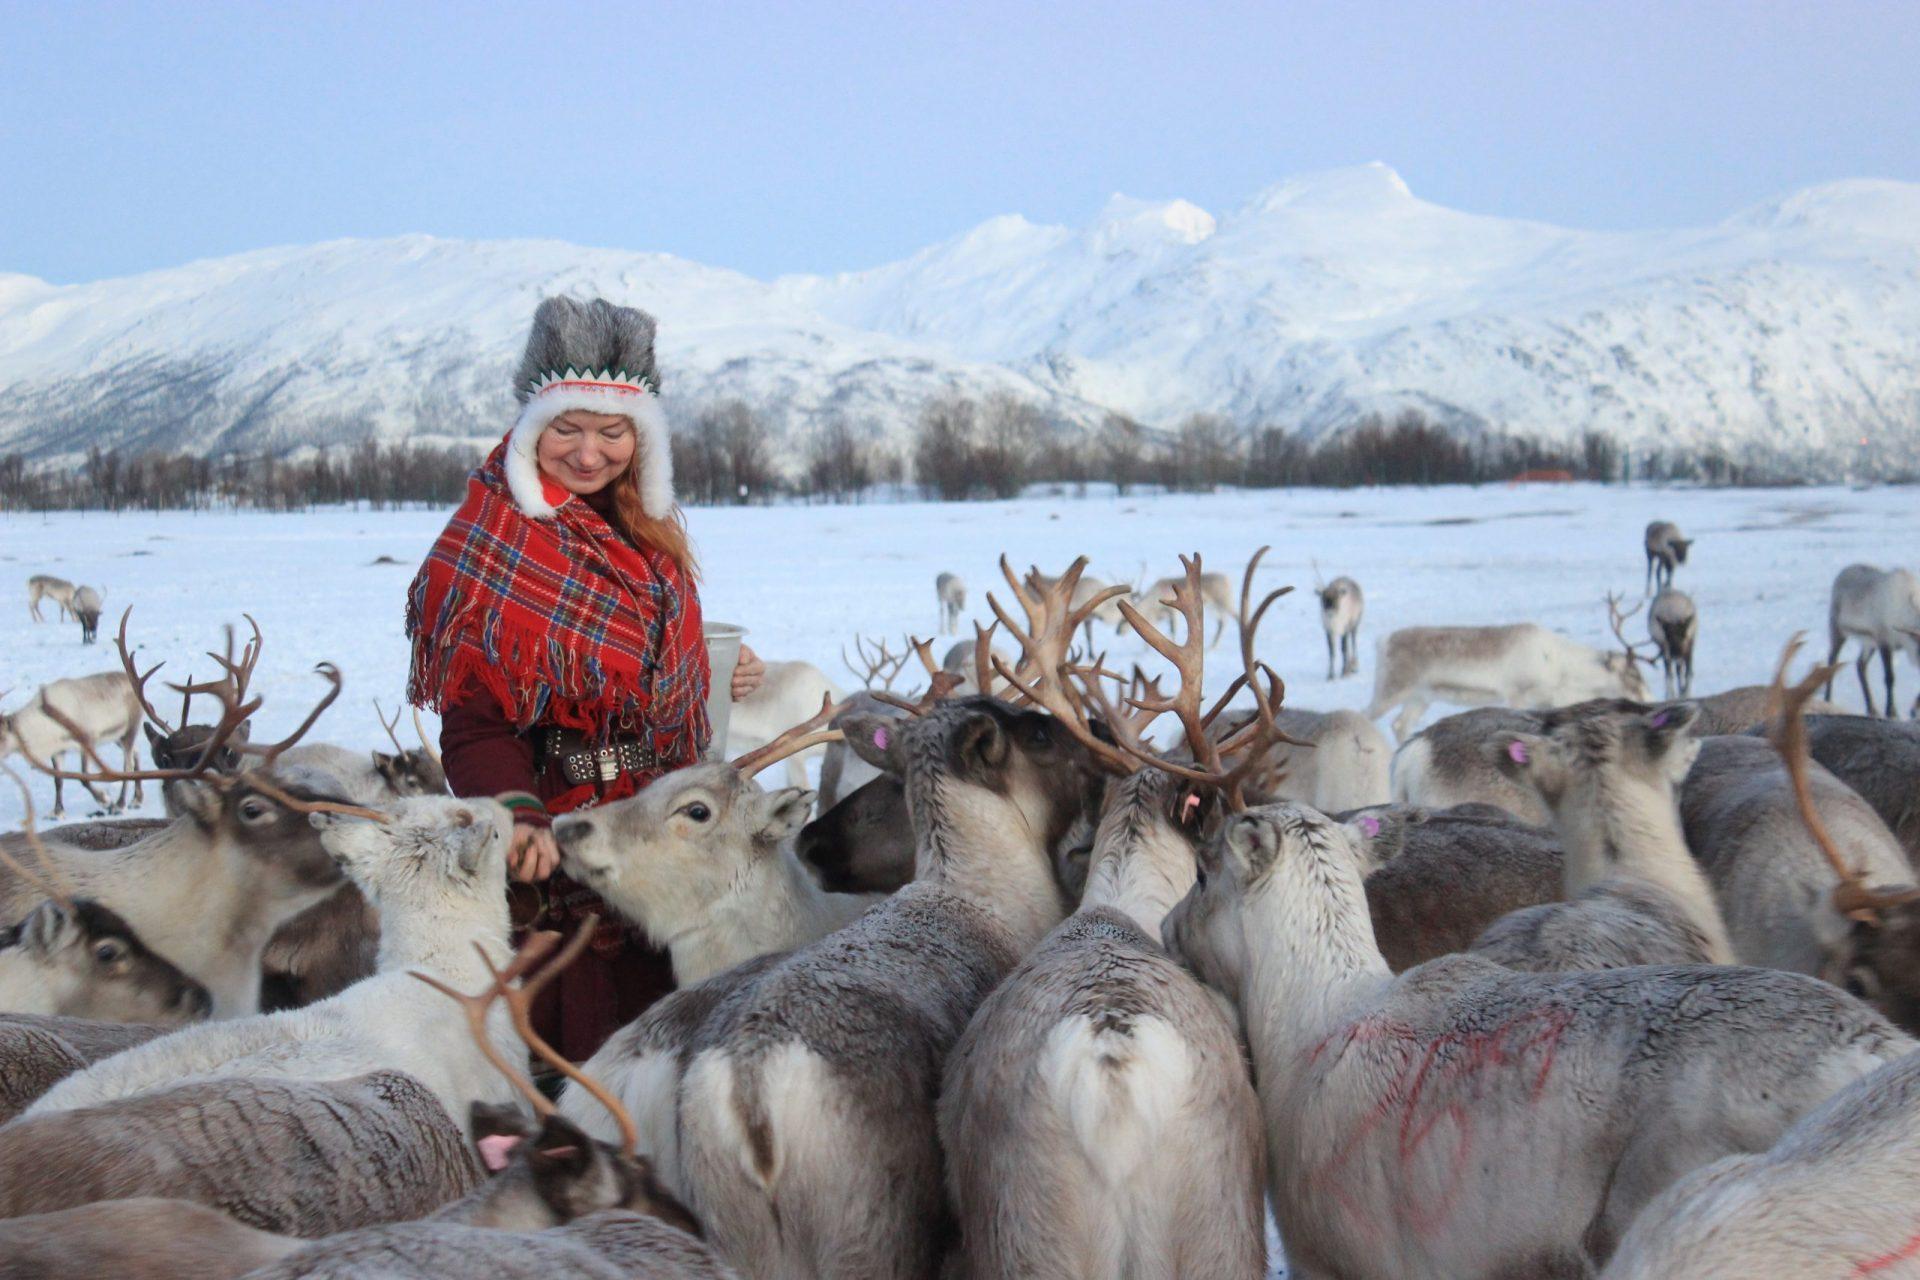 sami woman in traditional clothing feeding herd of reindeer